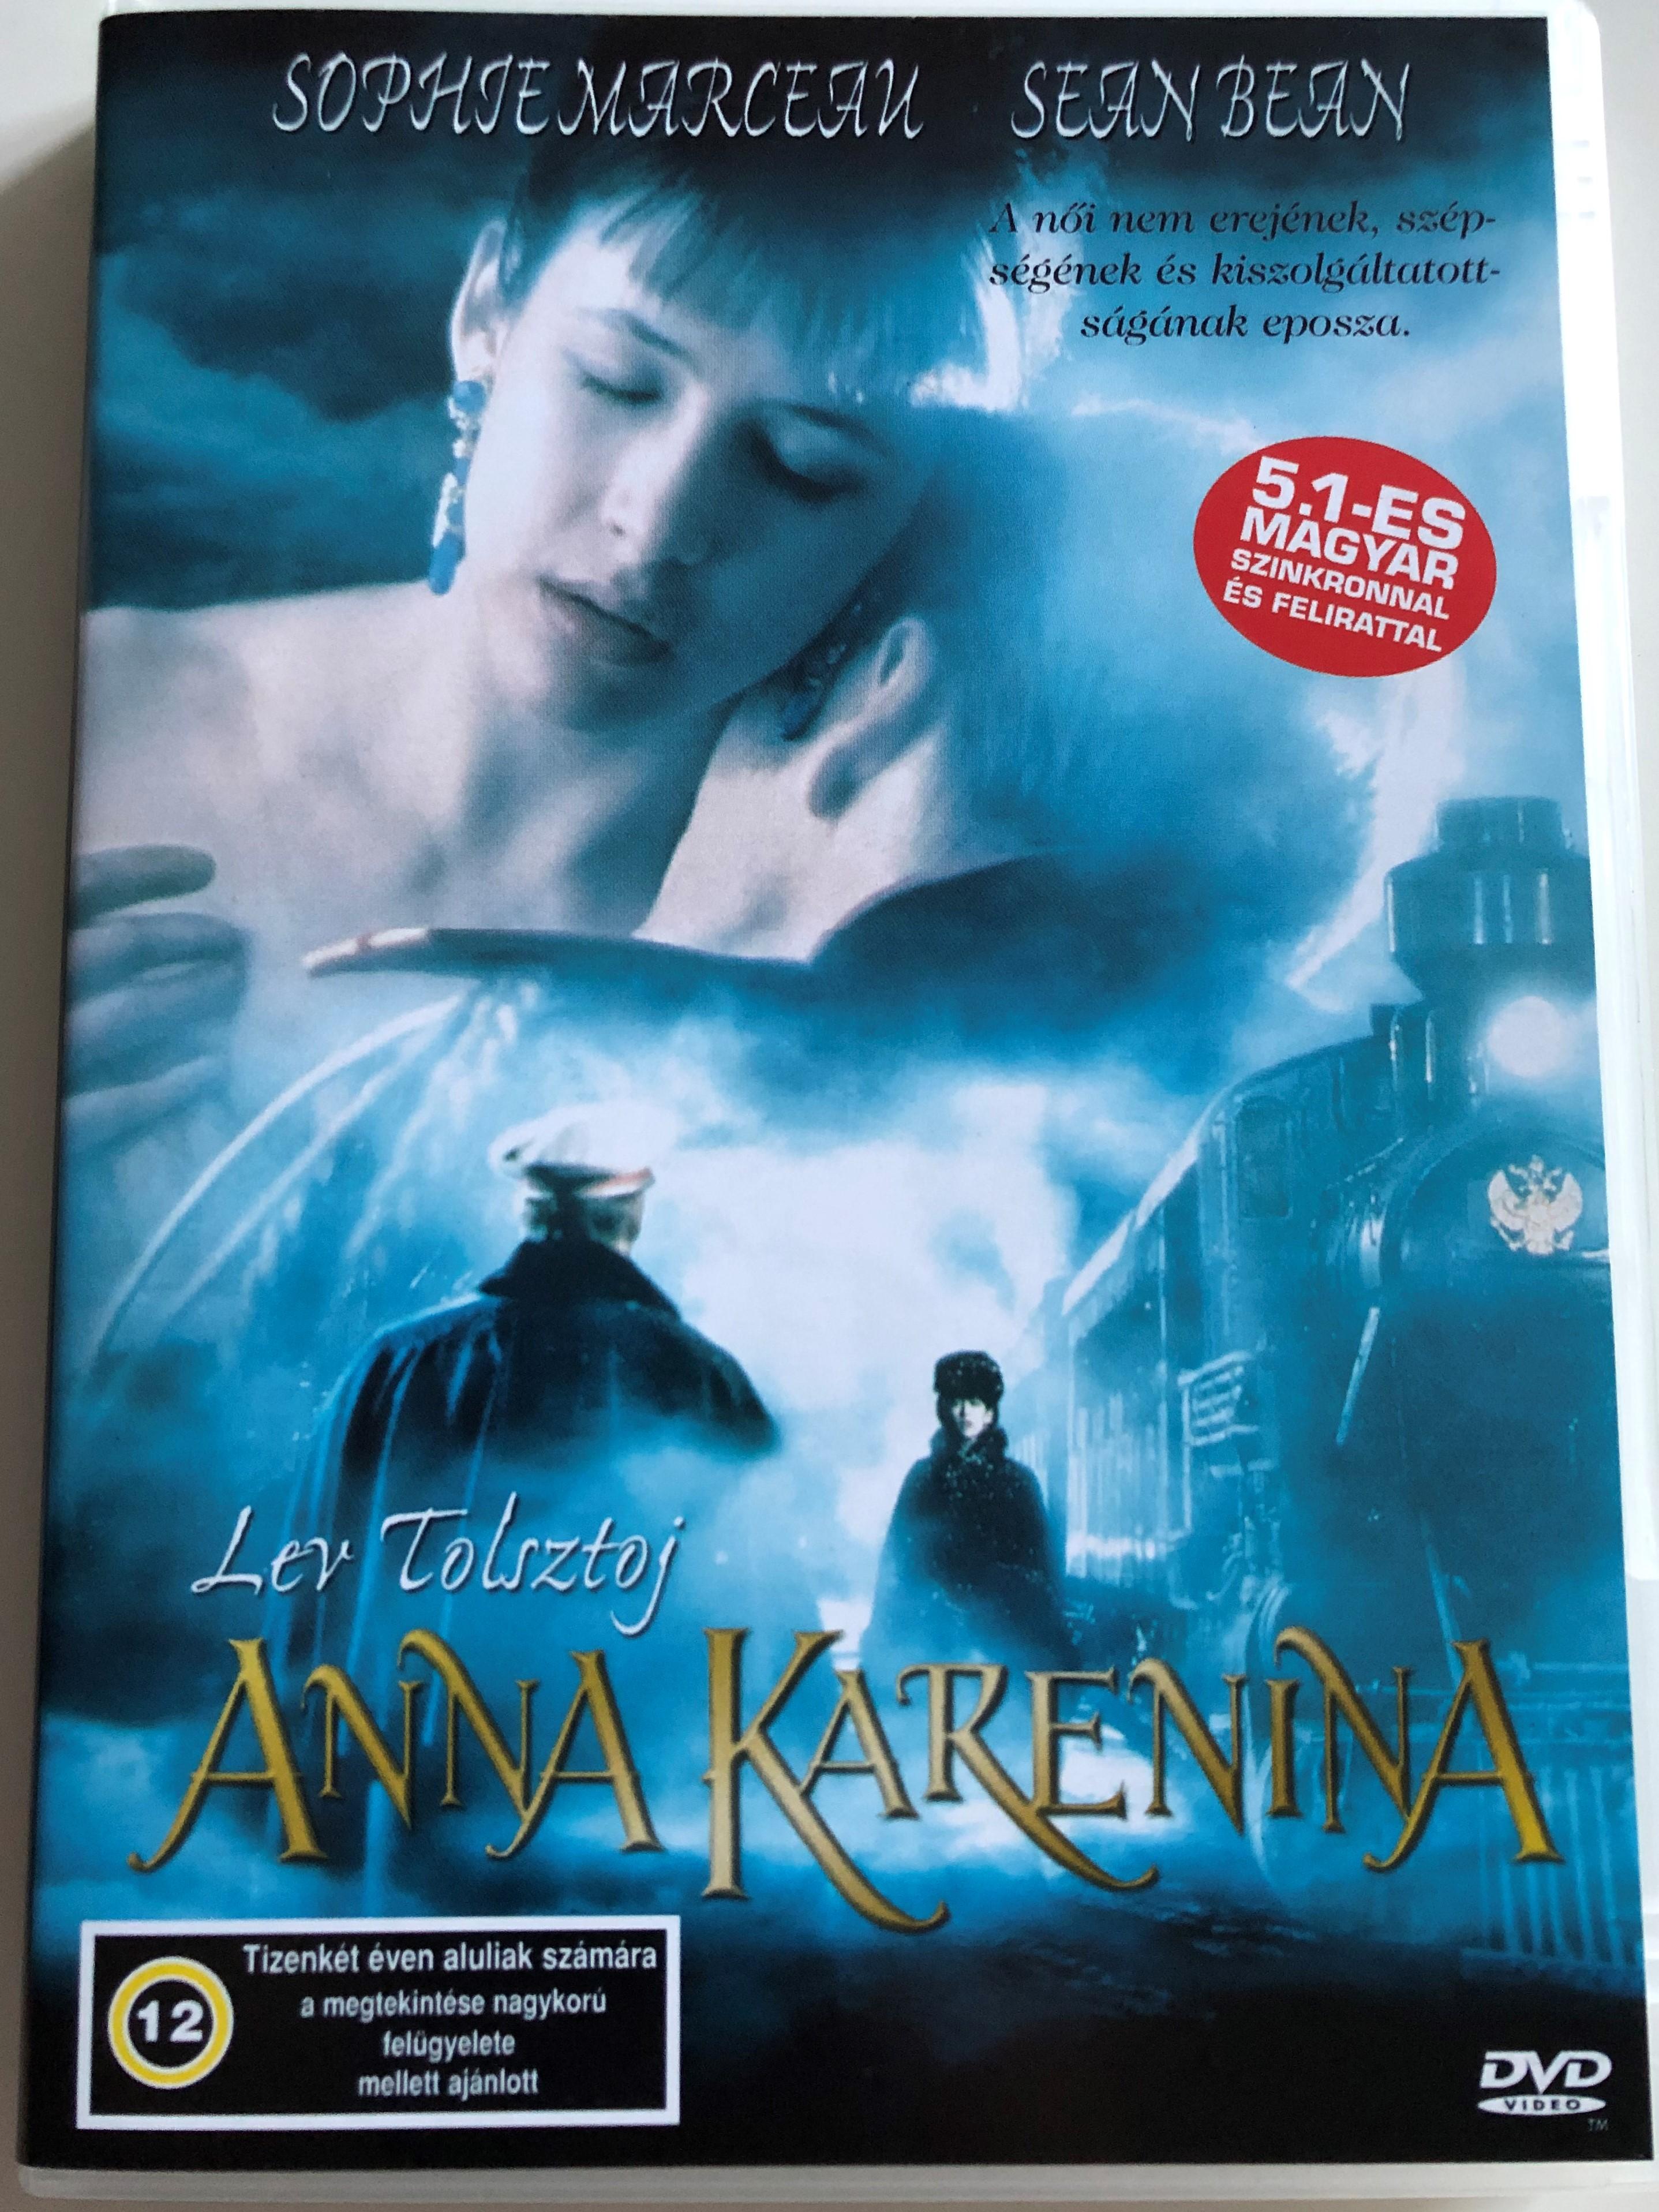 anna-karenina-dvd-1997-directed-by-bernard-rose-starring-sophie-marceau-sean-bean-lev-tolstoy-s-classic-novel-film-adaptation-1-.jpg